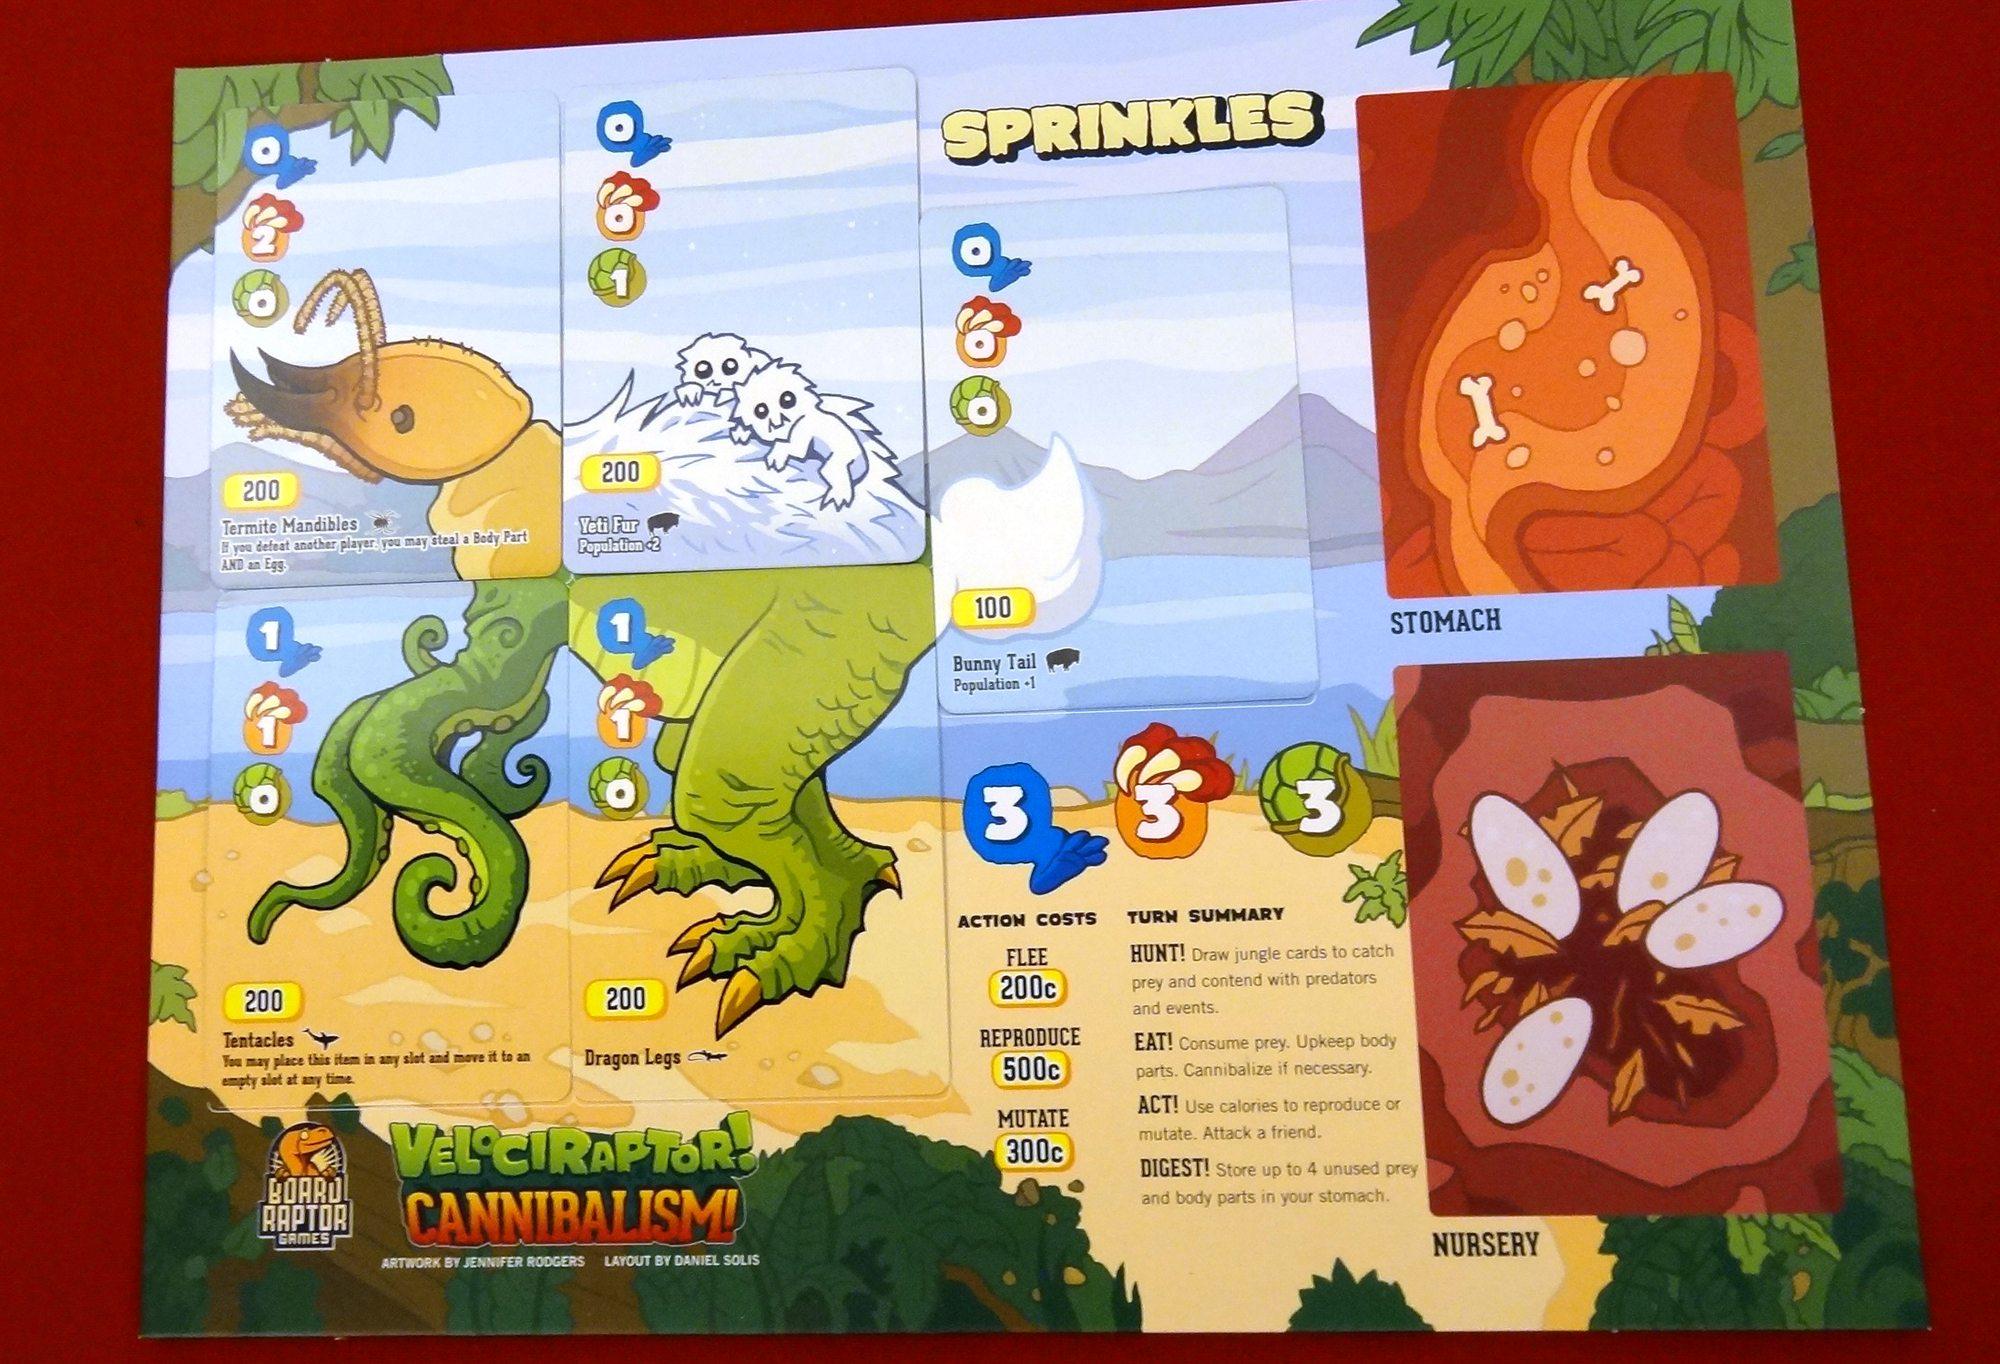 Velociraptor! Cannibalism! sprinkles